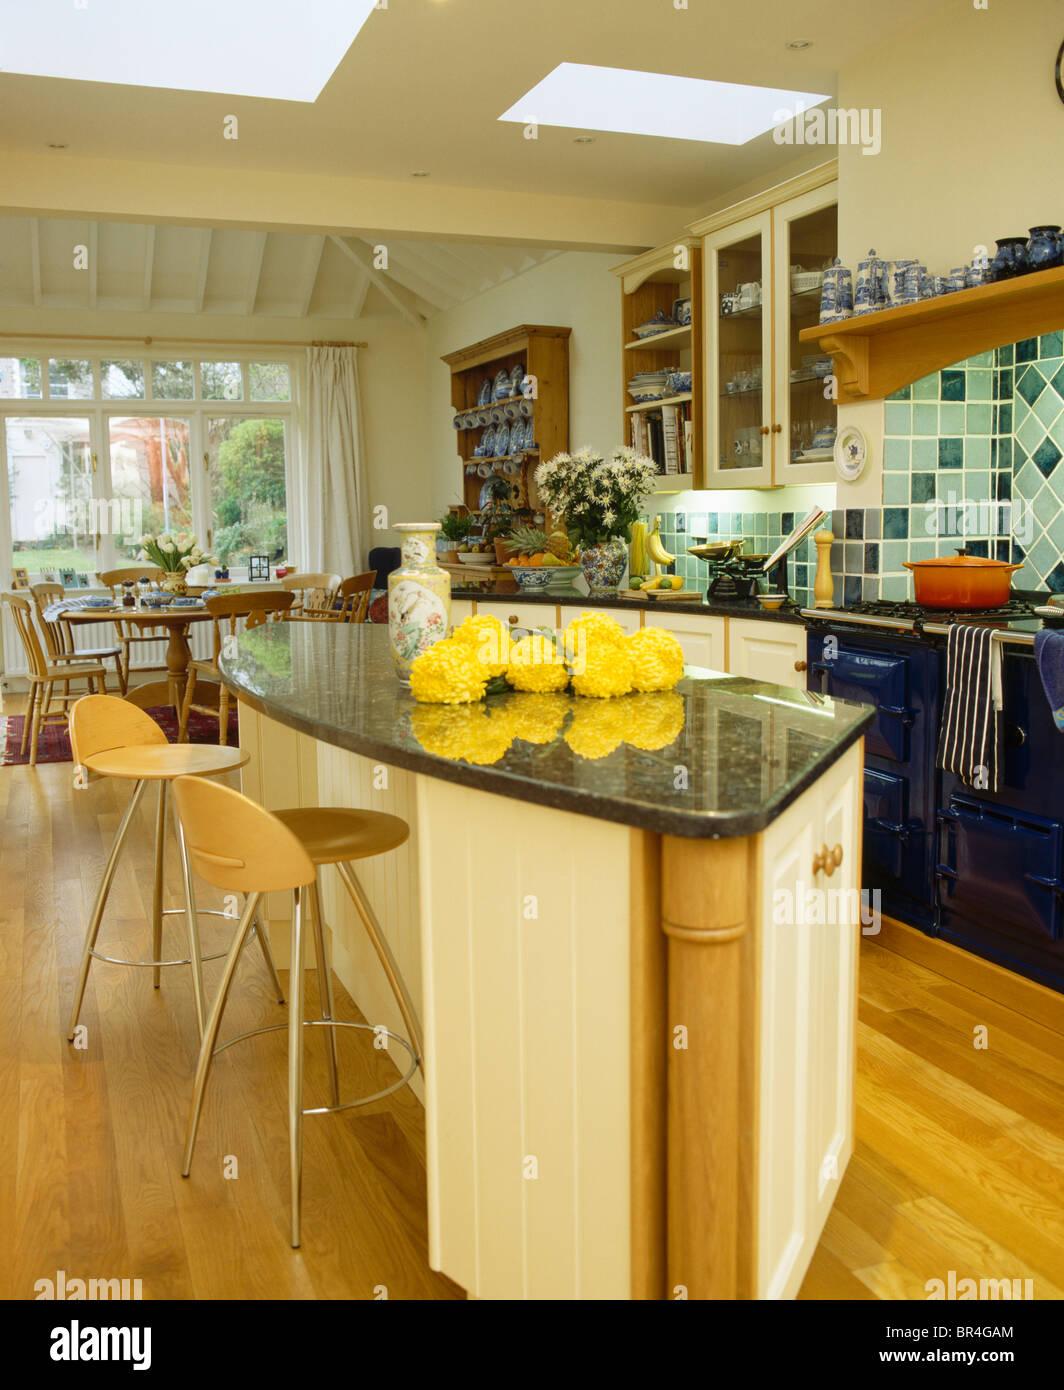 Large Kitchen Breakfast Bar Stockfotos & Large Kitchen Breakfast Bar ...